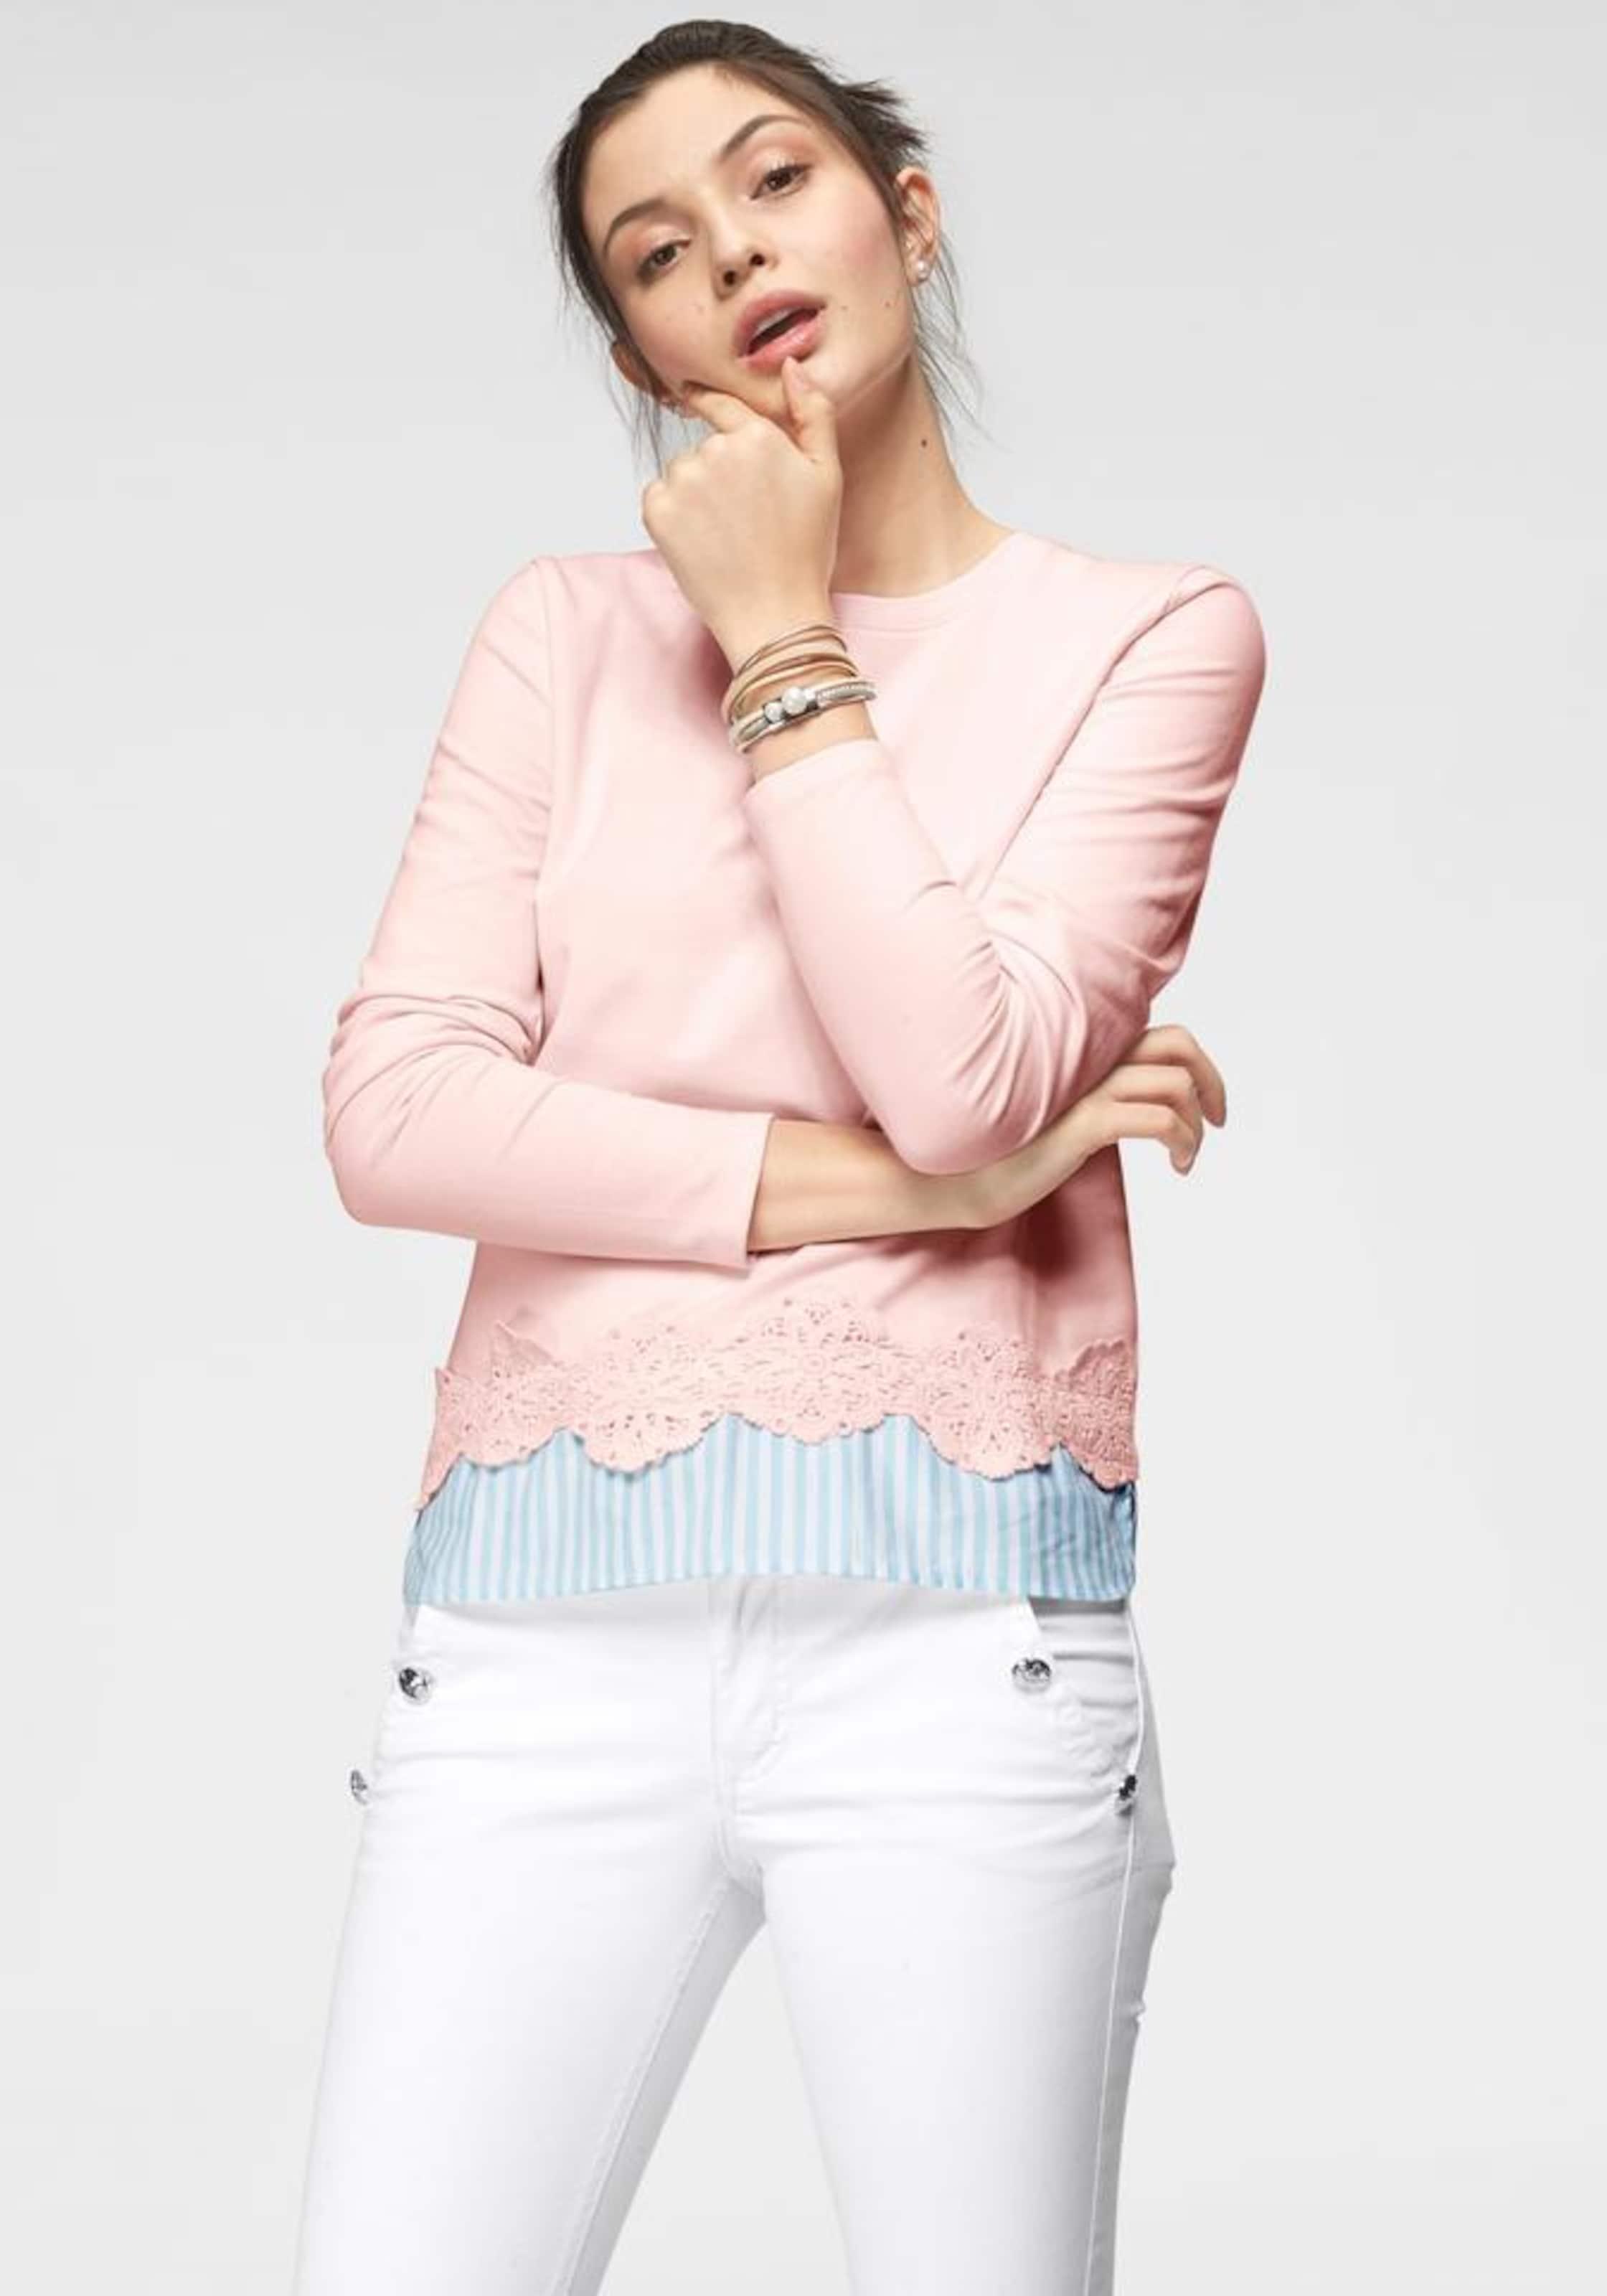 Team Rosé Tailor Polo Sweatshirt In Tom drBEQxoeWC